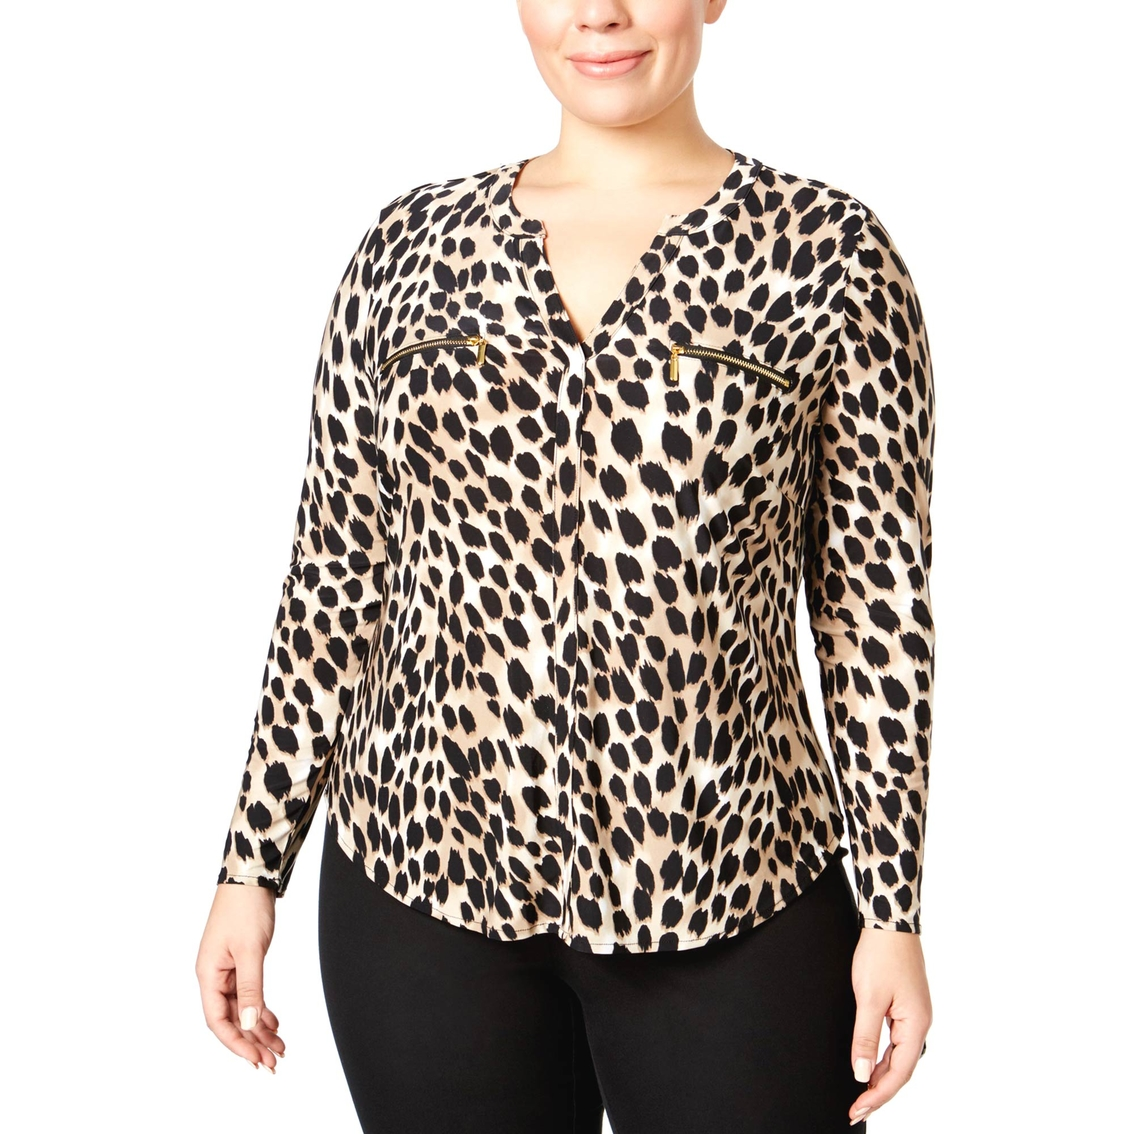 c9bfe536d0545 Inc International Concepts Plus Size Animal Print Blouse